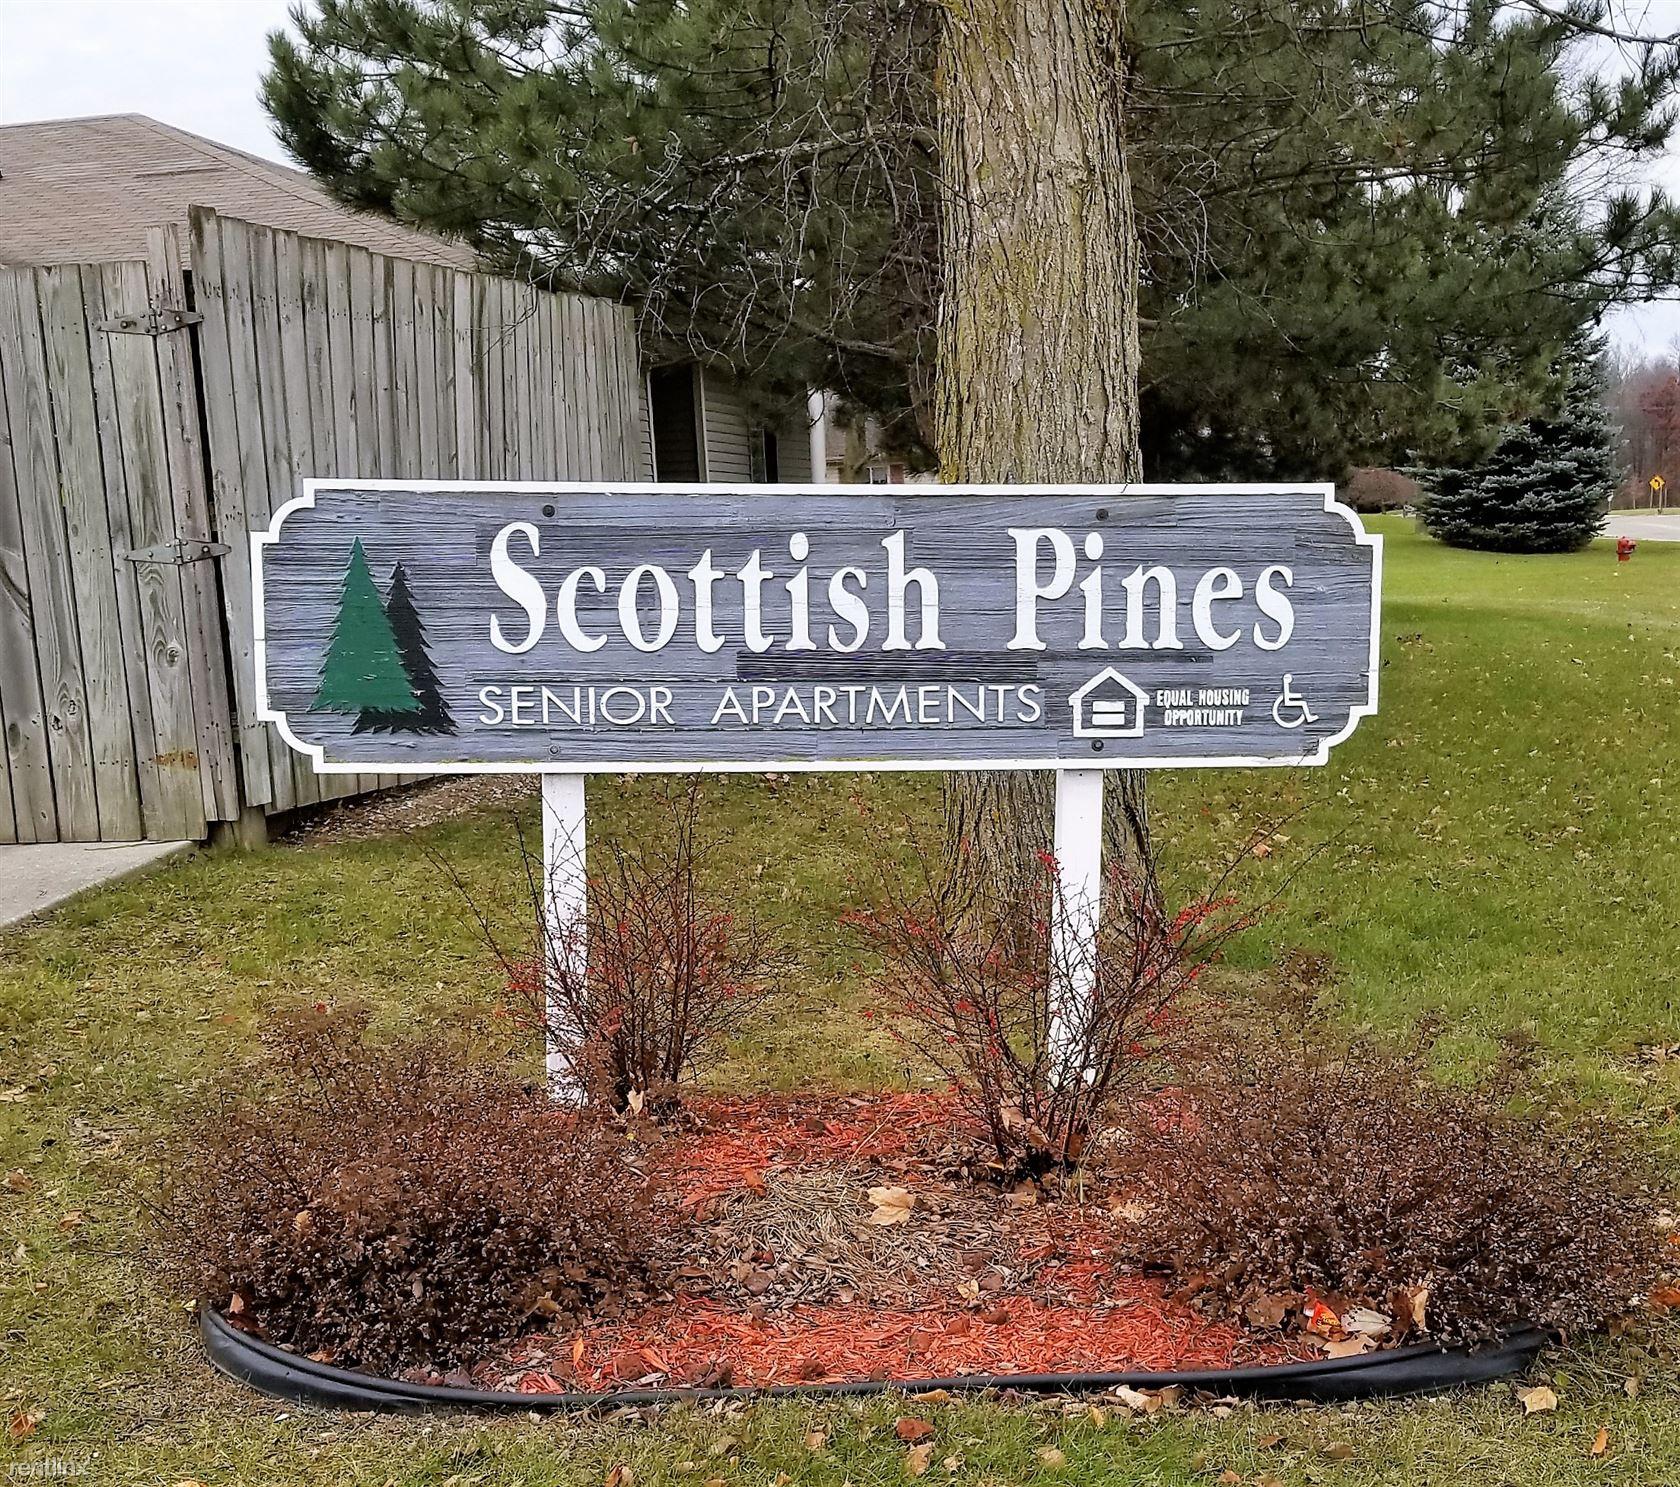 1575 Pine Ave, Alma, MI - $542